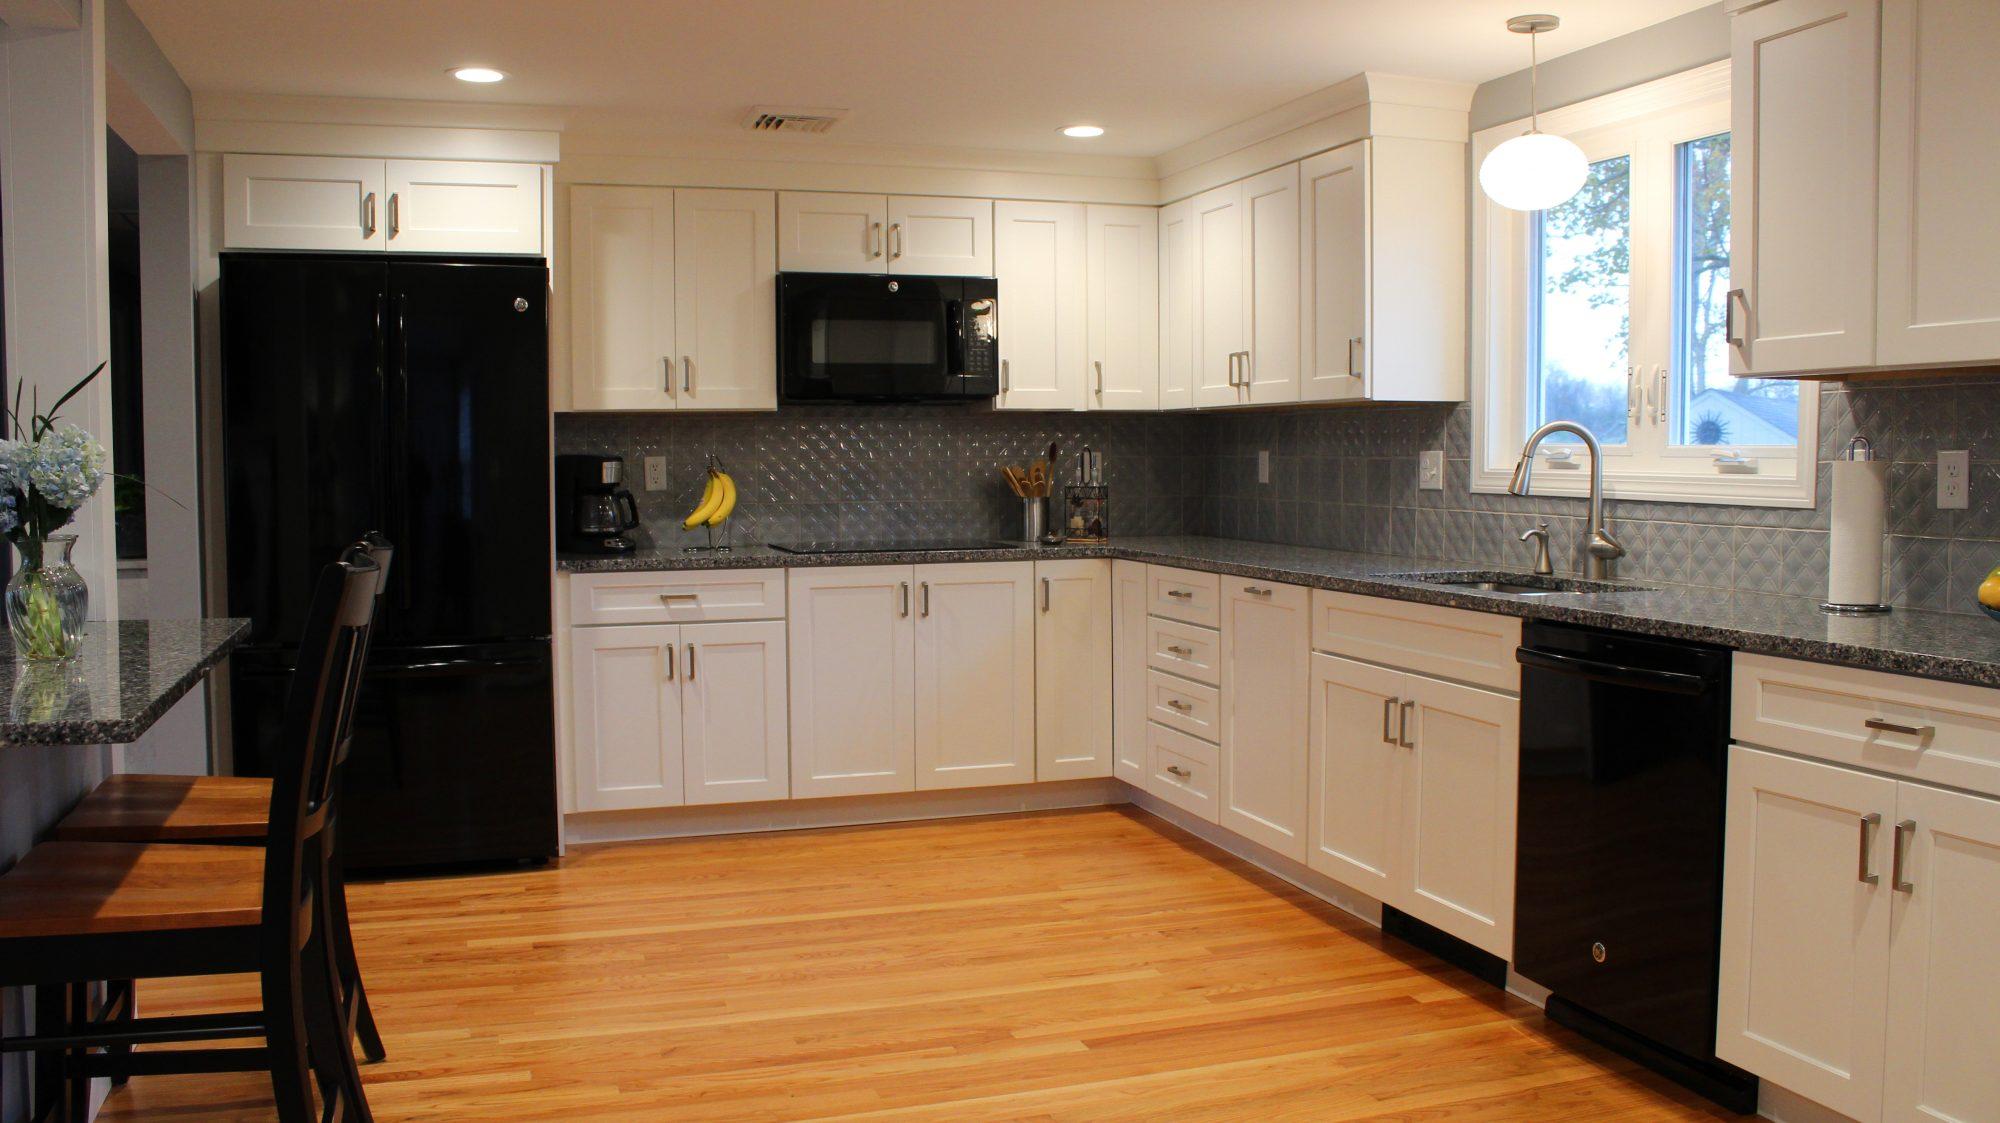 L&S Builders Updates Medallion Kitchen in Enfield, CT